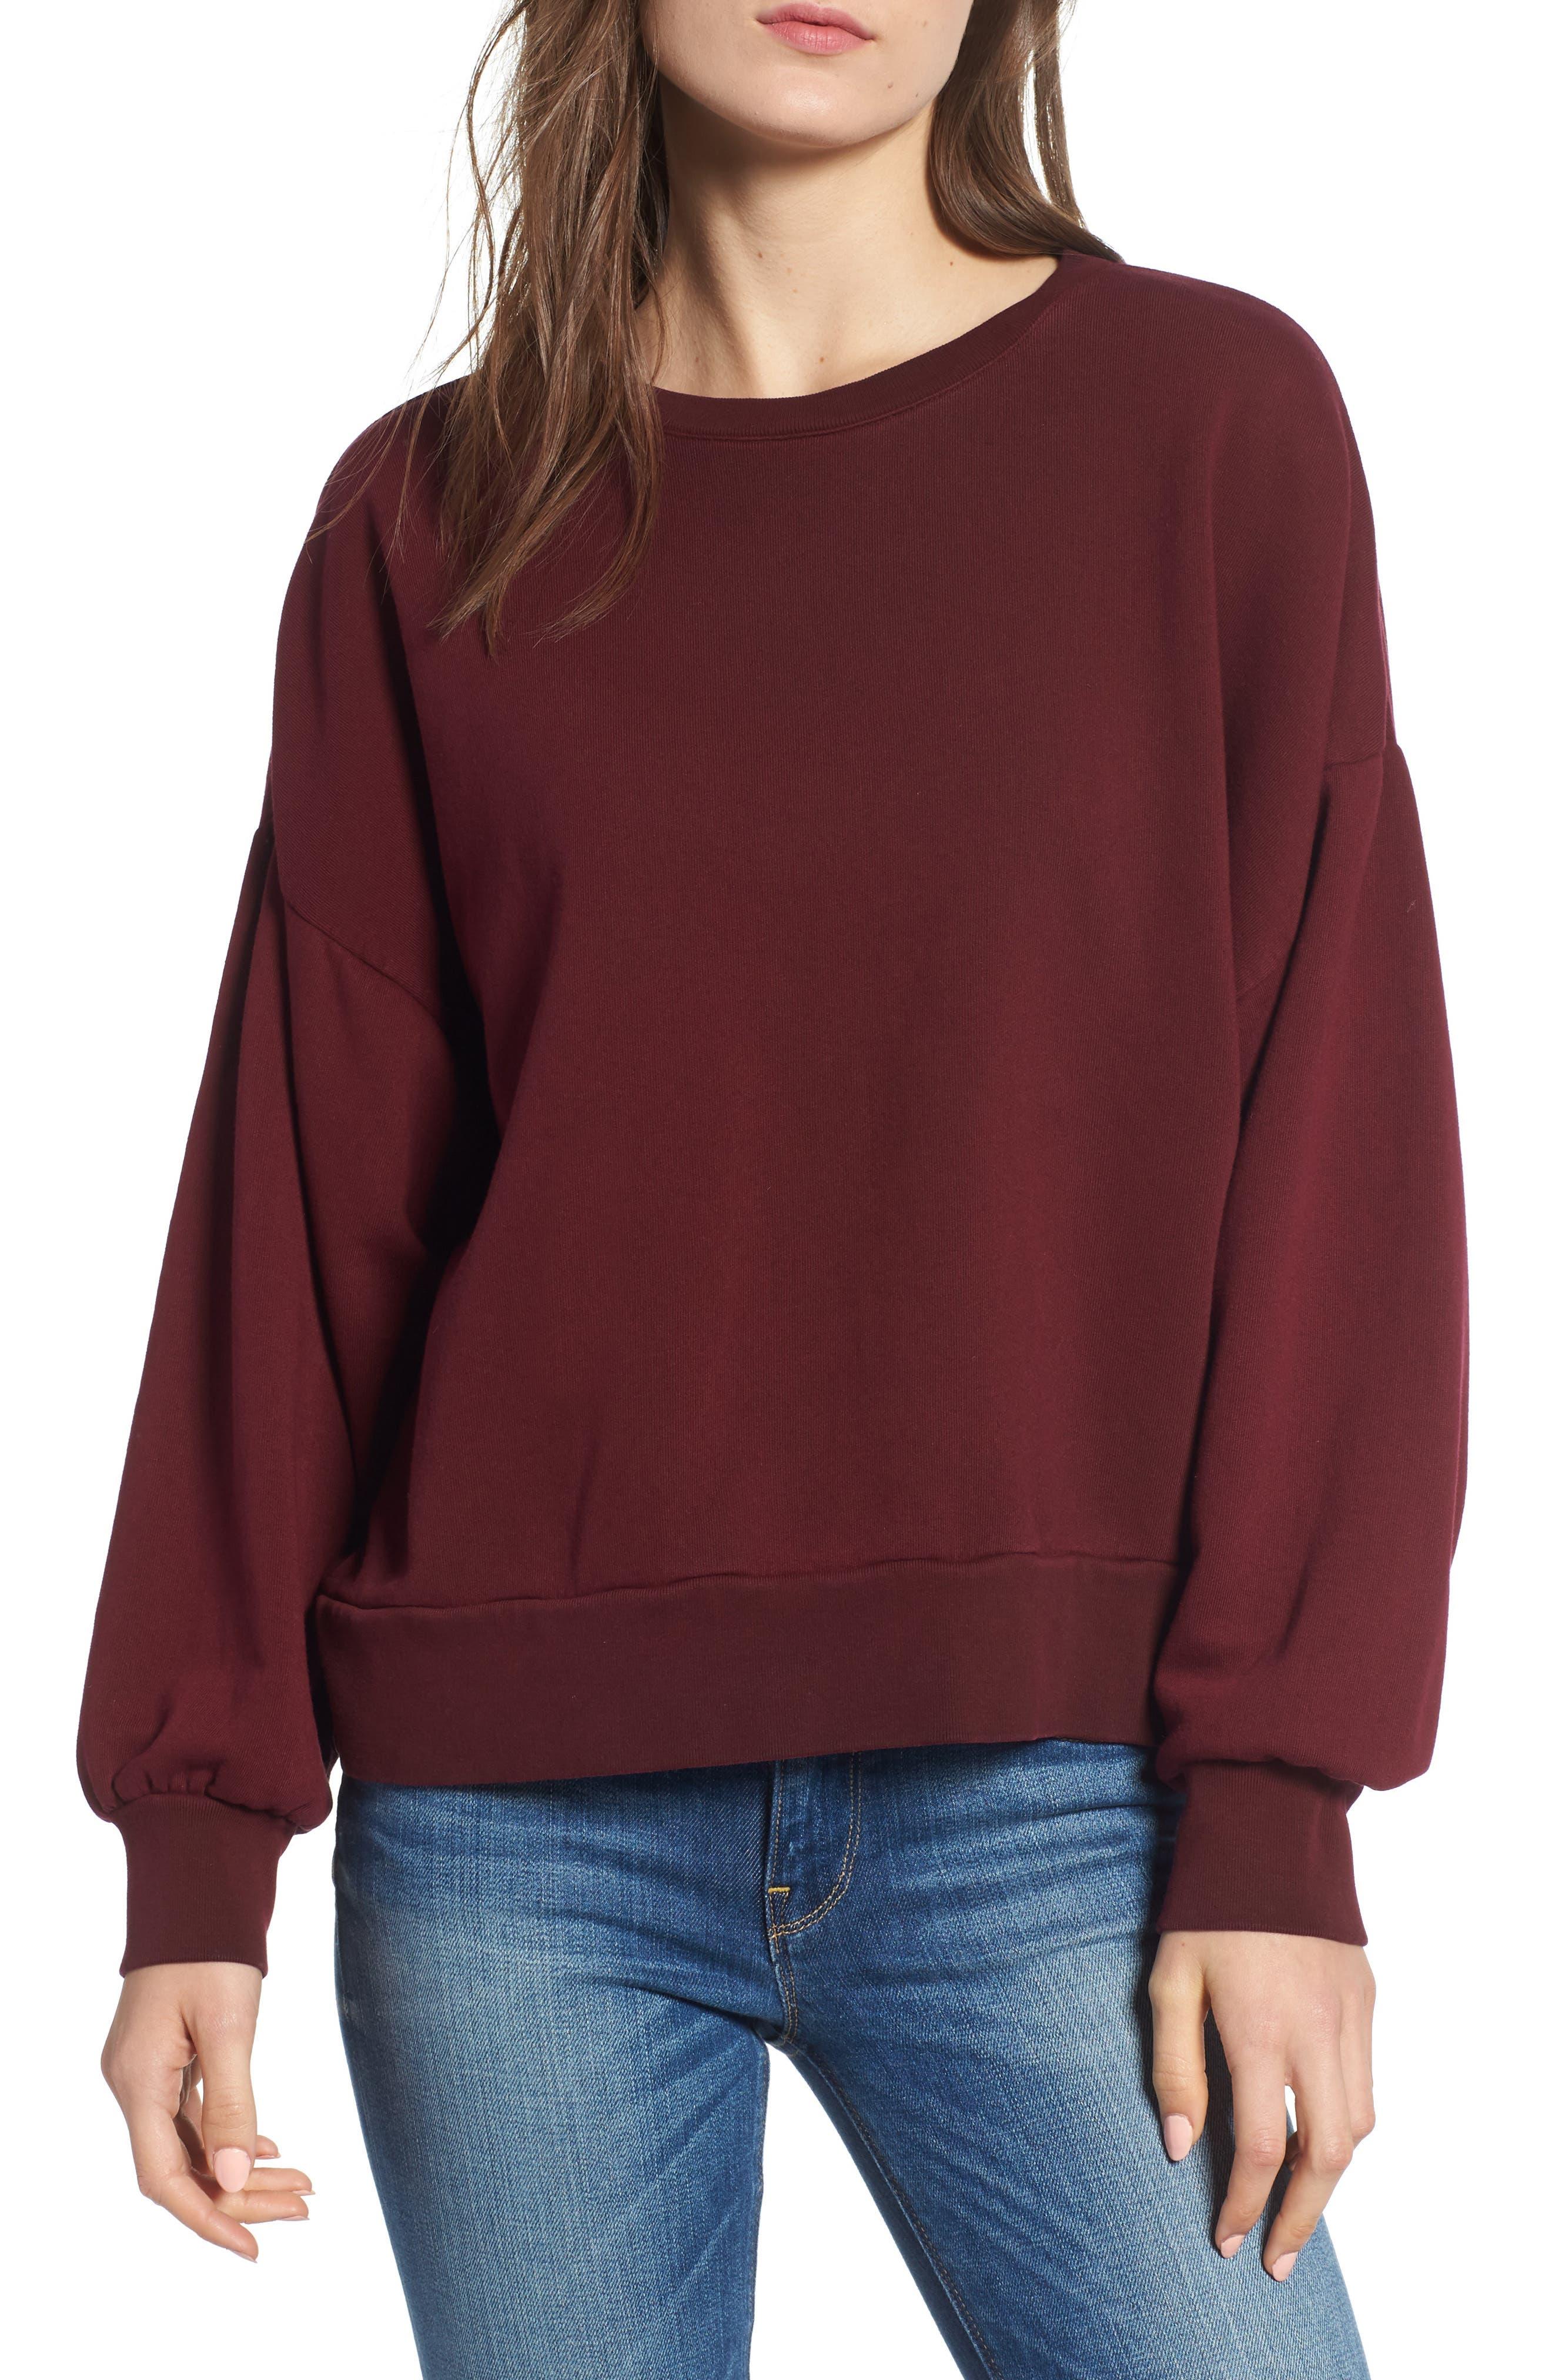 Hudson Jeans Cutout Back Sweatshirt, Pink